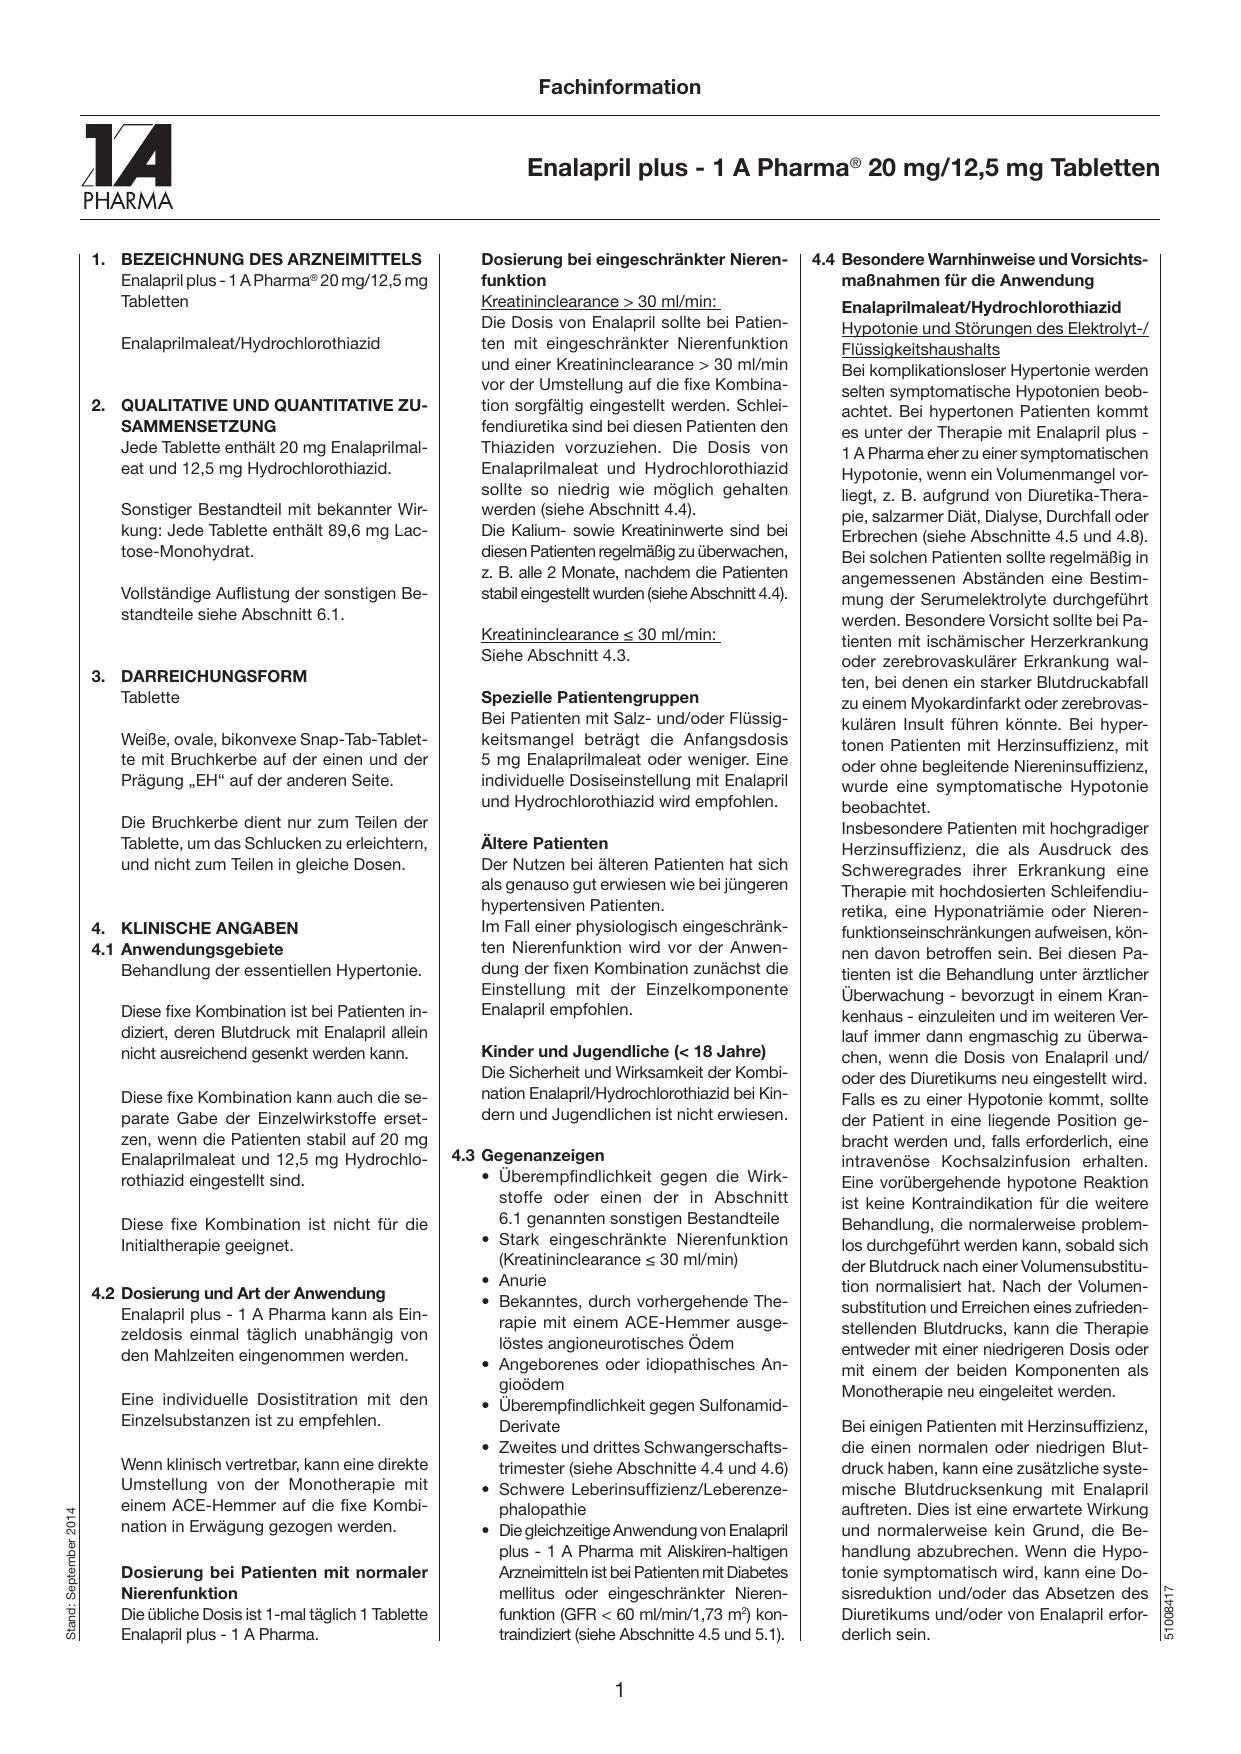 Enalapril plus - 1 A Pharma® 20 mg/12,5 mg Tabletten